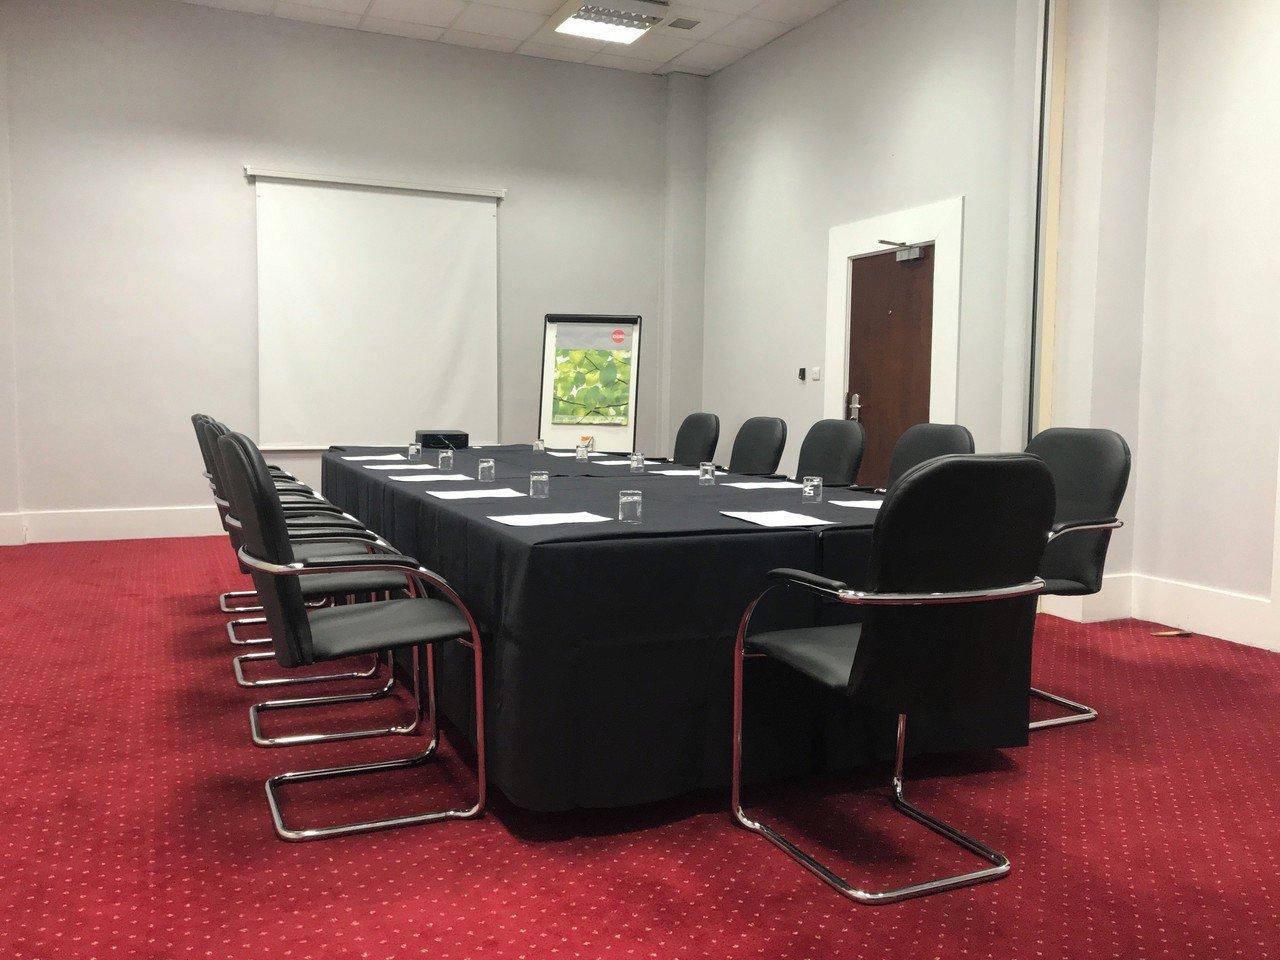 Sheffield seminar rooms Salle de réunion Sheffield Metropolitan Hotel image 0